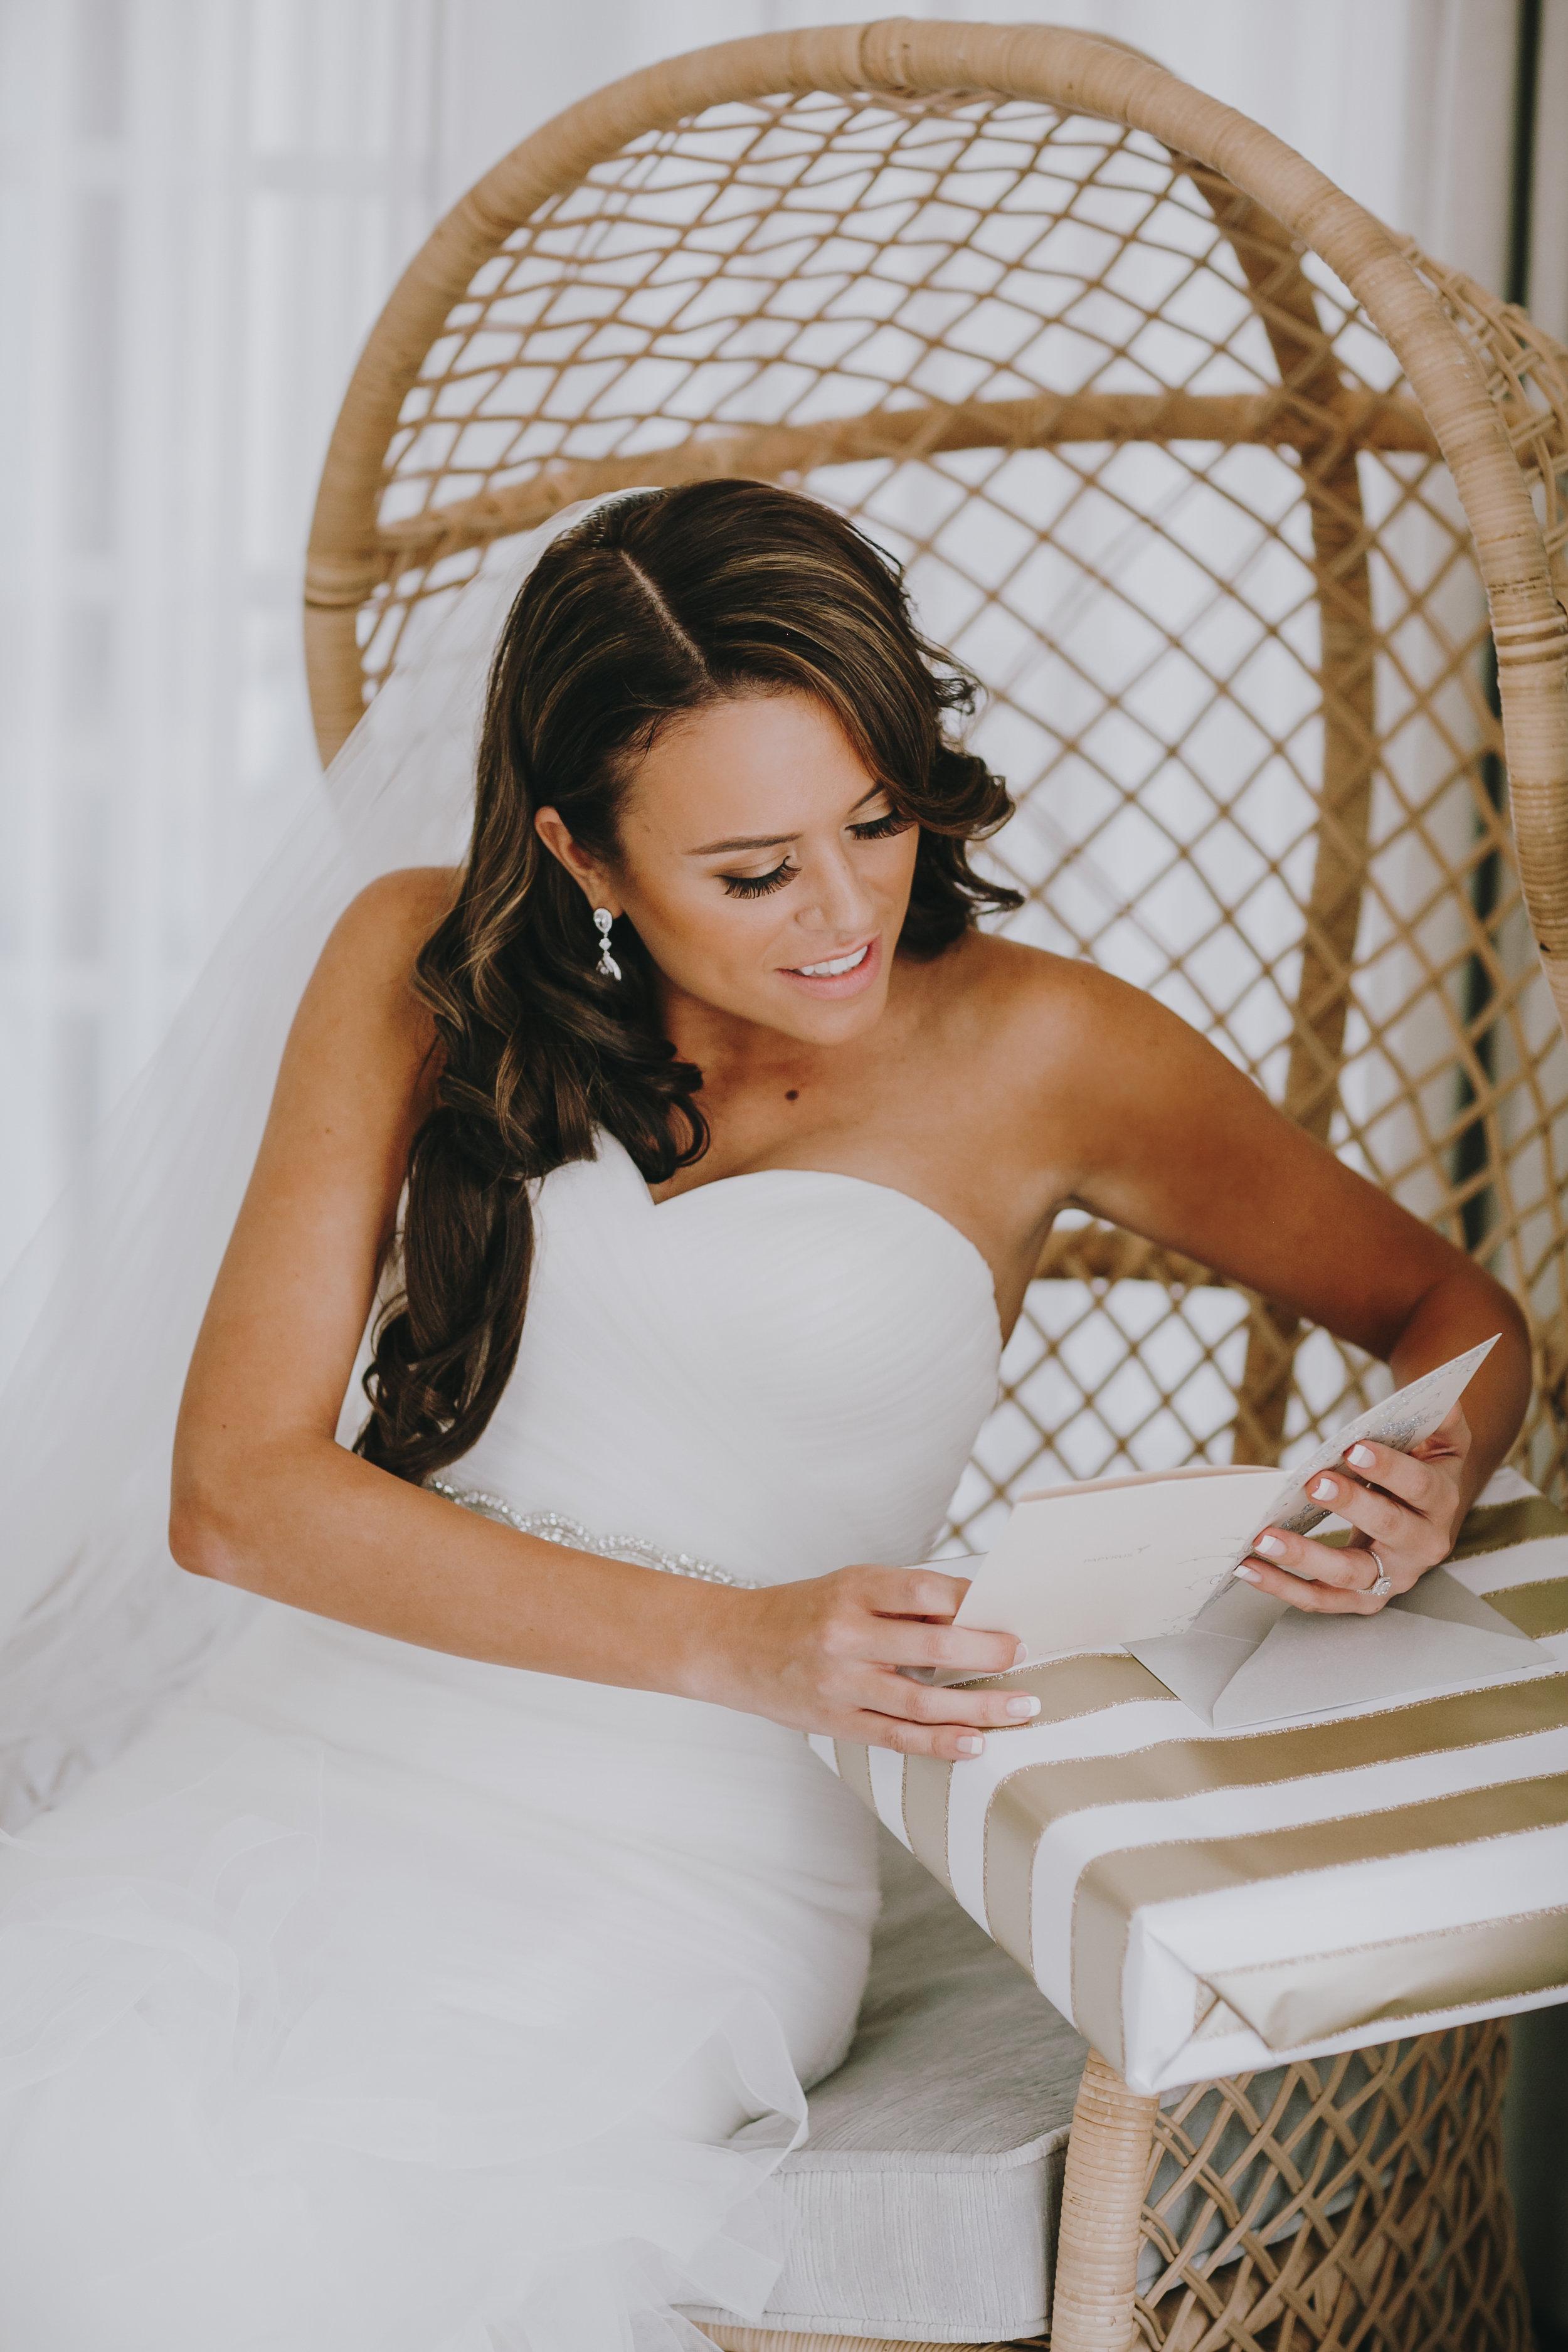 San-Diego-Military-Wedding-hair-makeup-thevanitybelle.com